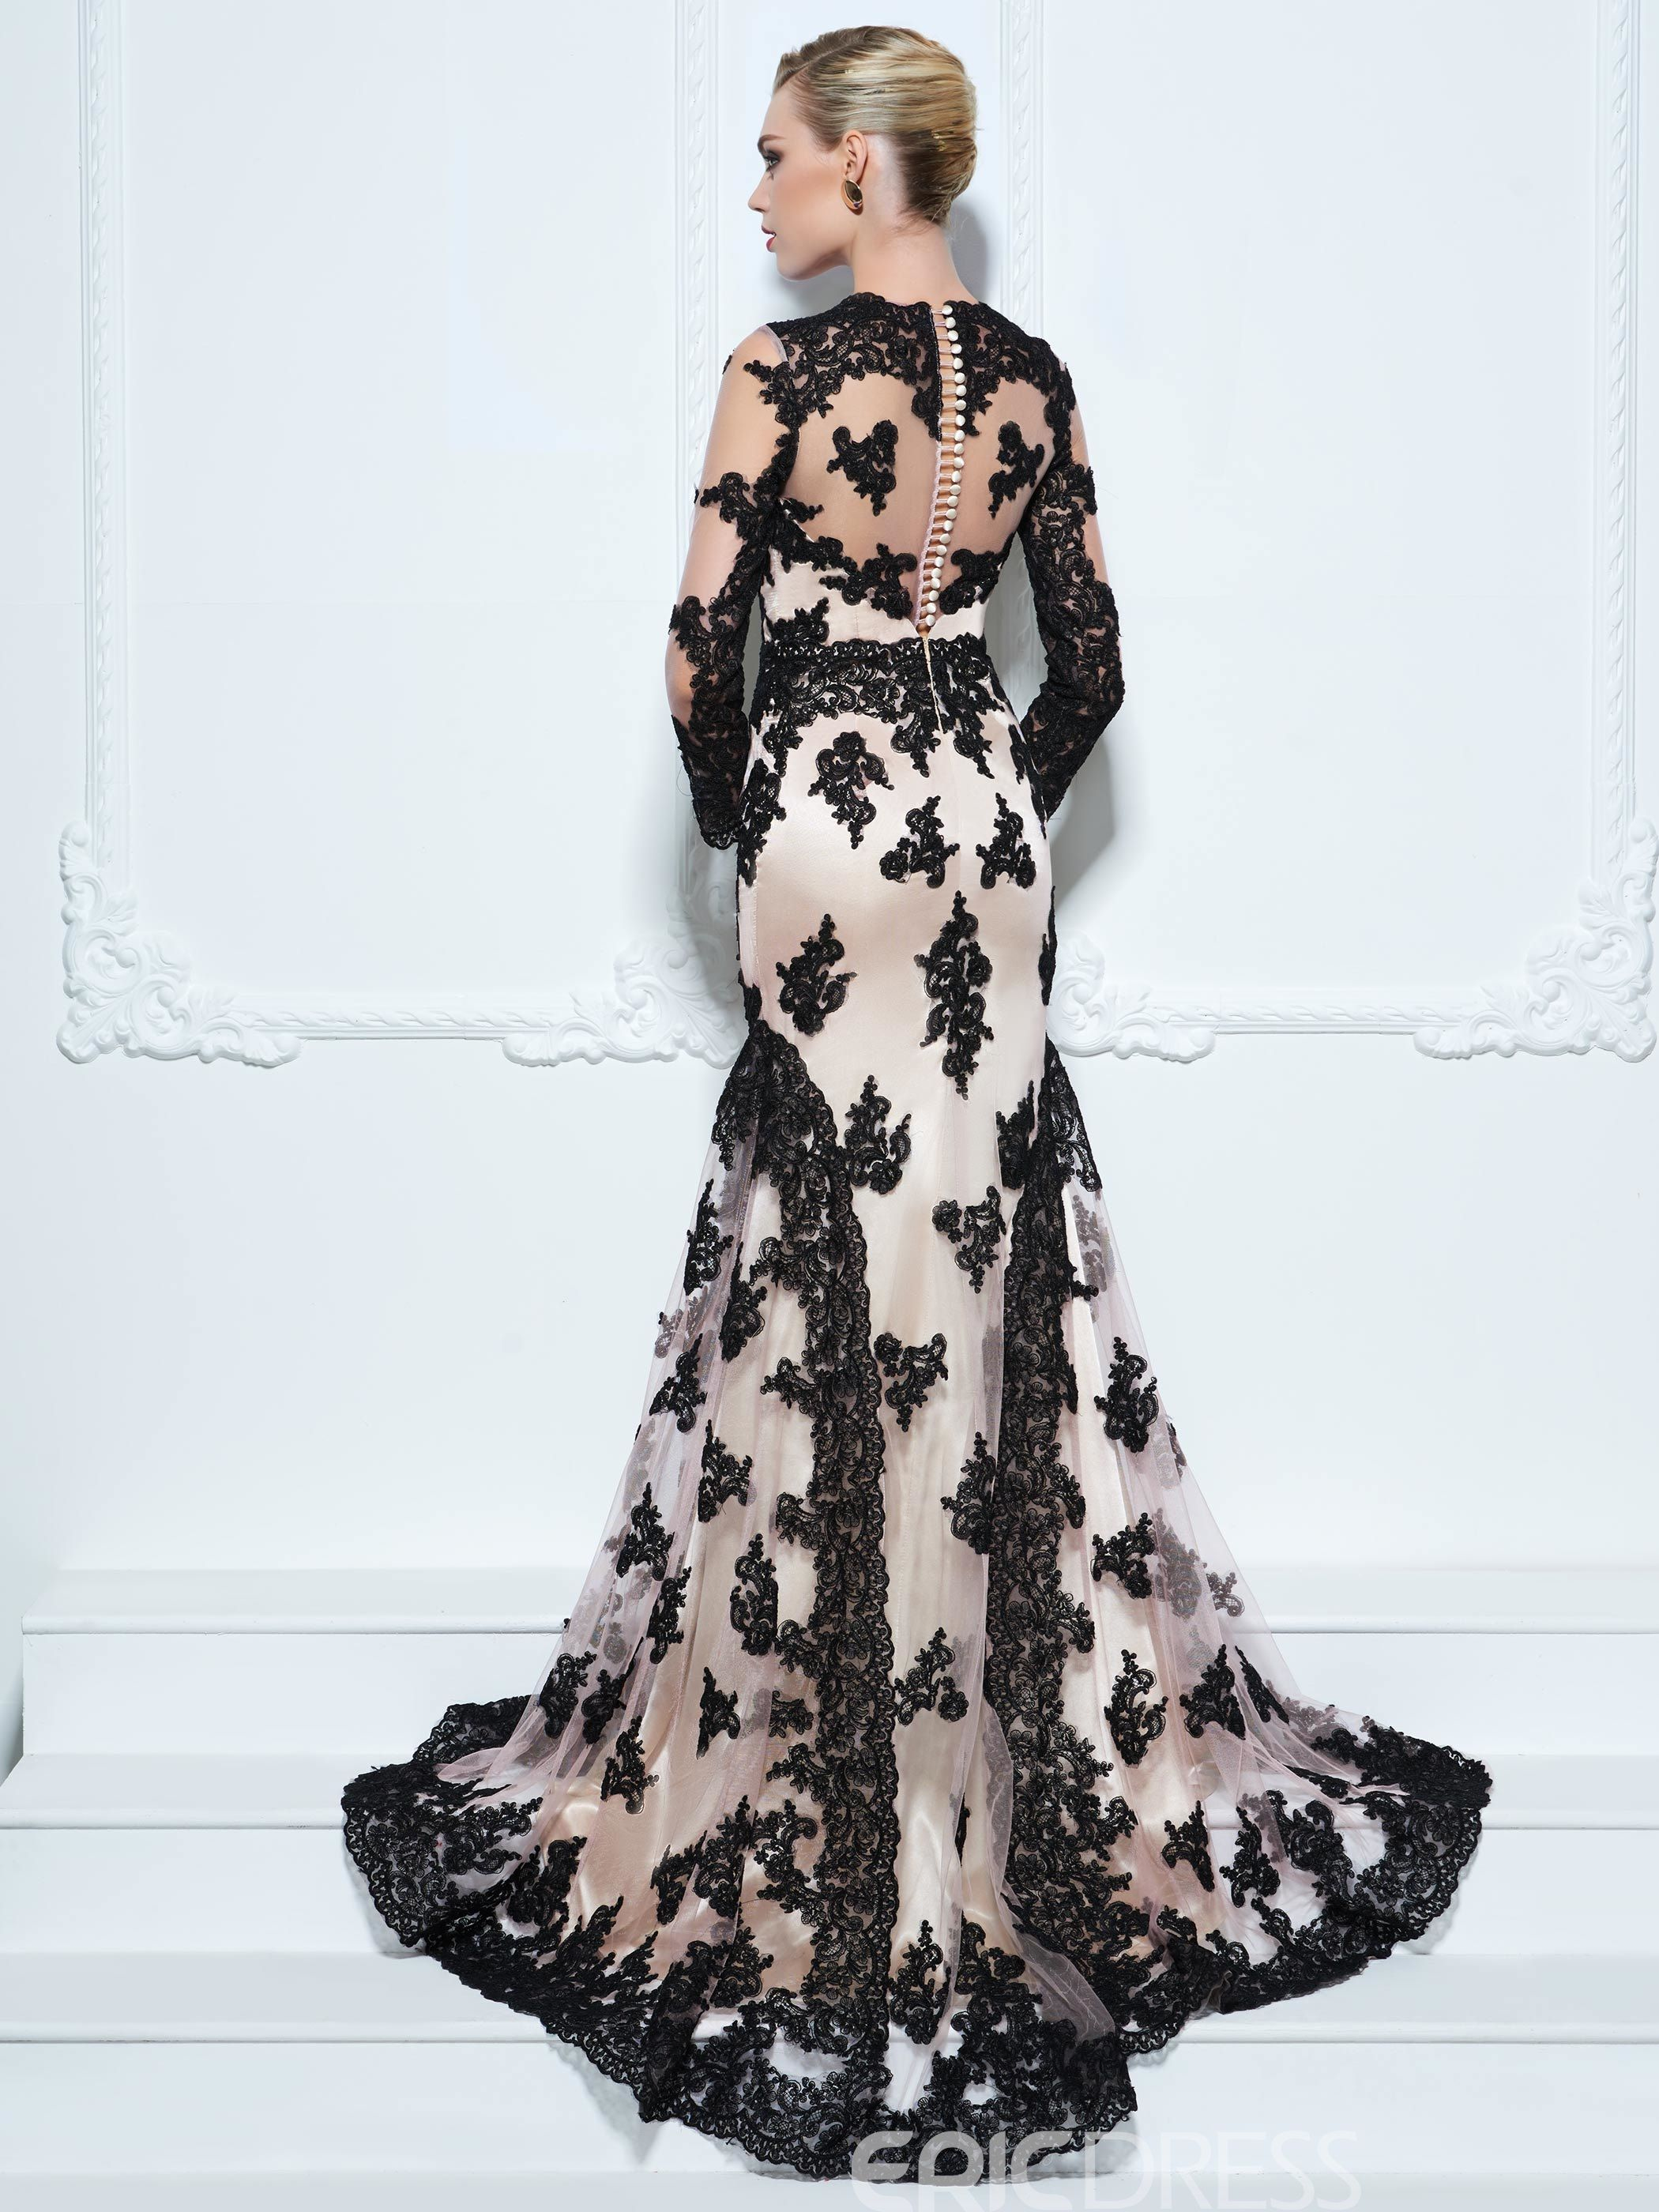 Long Sleeve Black Lace Overlay Wedding Gown With Short Train Trumpet Evening Dress Designer Evening Dresses Dresses [ 2800 x 2100 Pixel ]